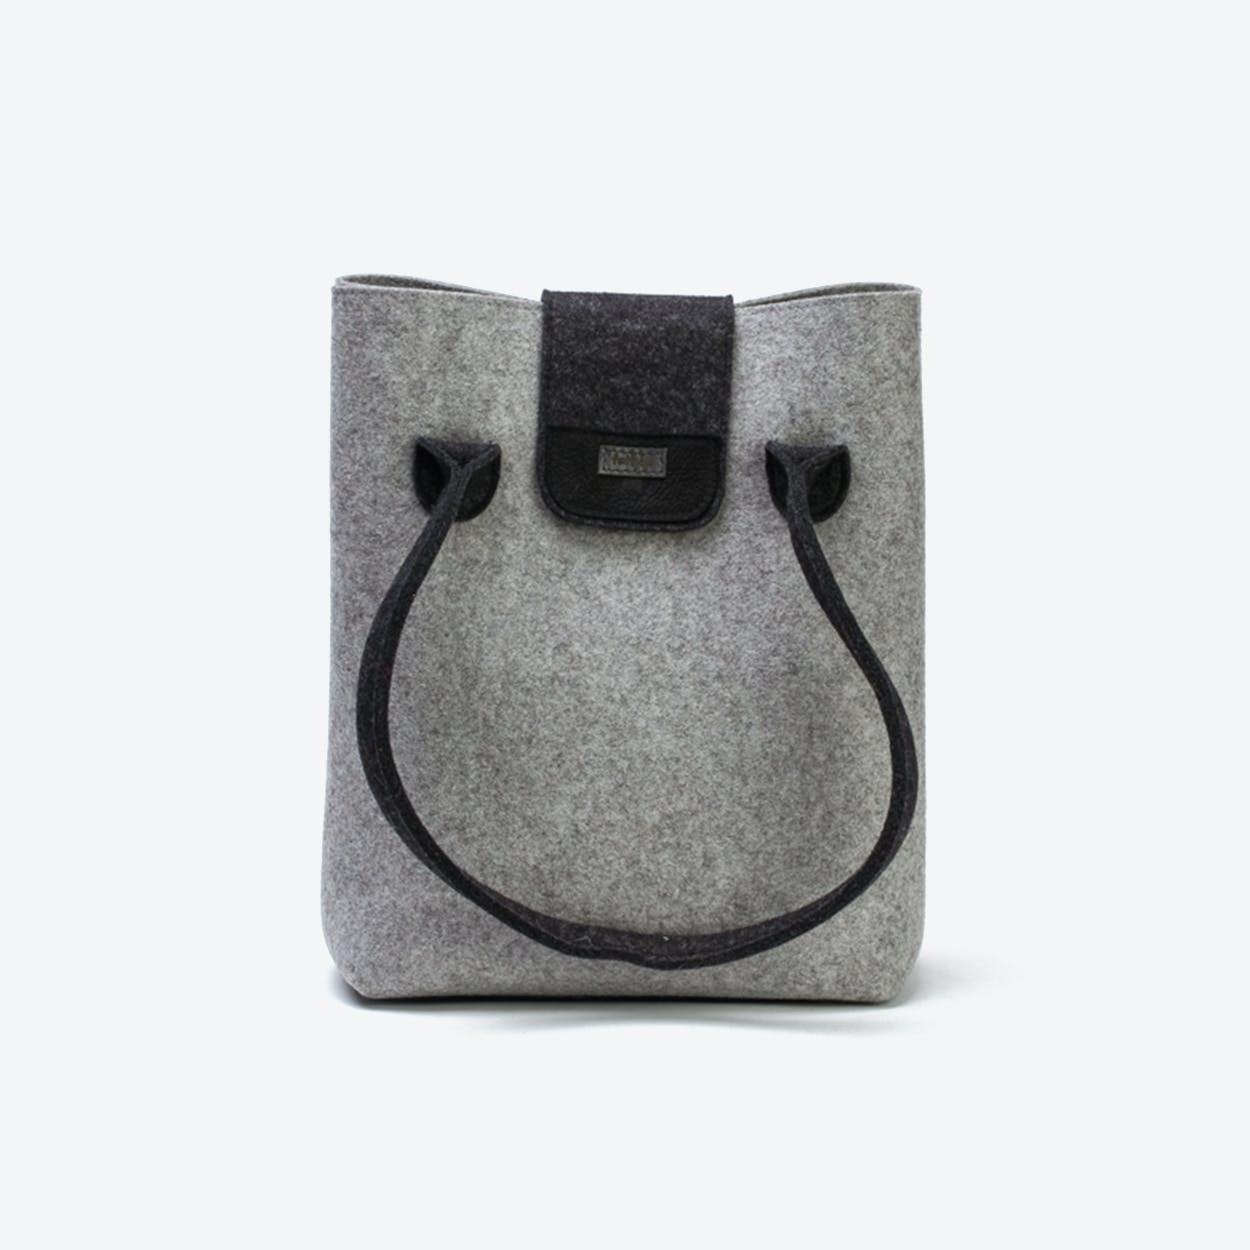 Practical Bag in Light Mottled/Anthracite